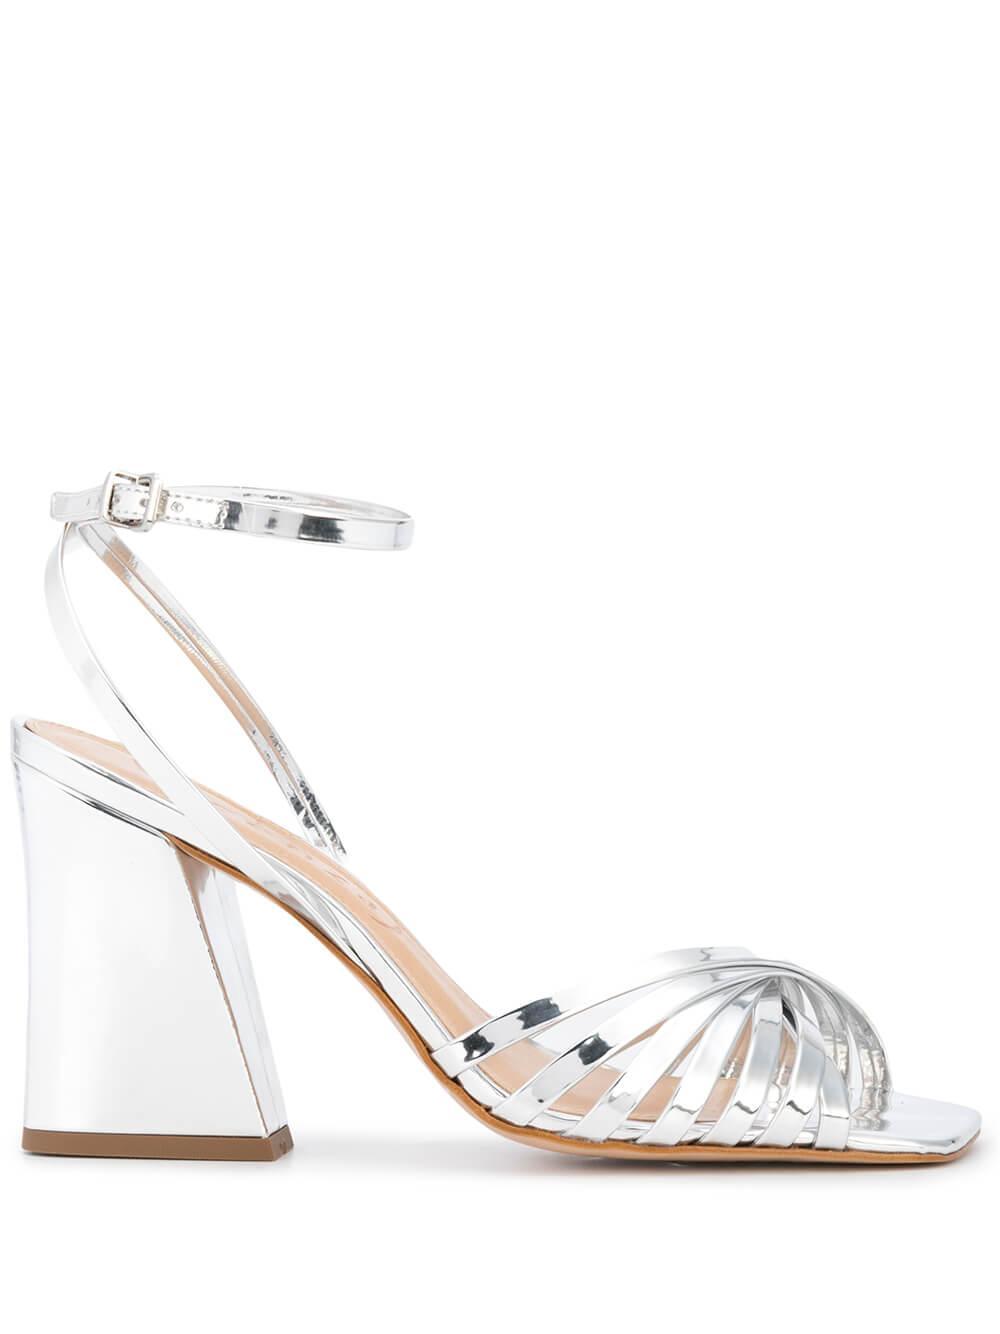 Metallic Strappy Block Heel Sandal Item # BARILOCHE